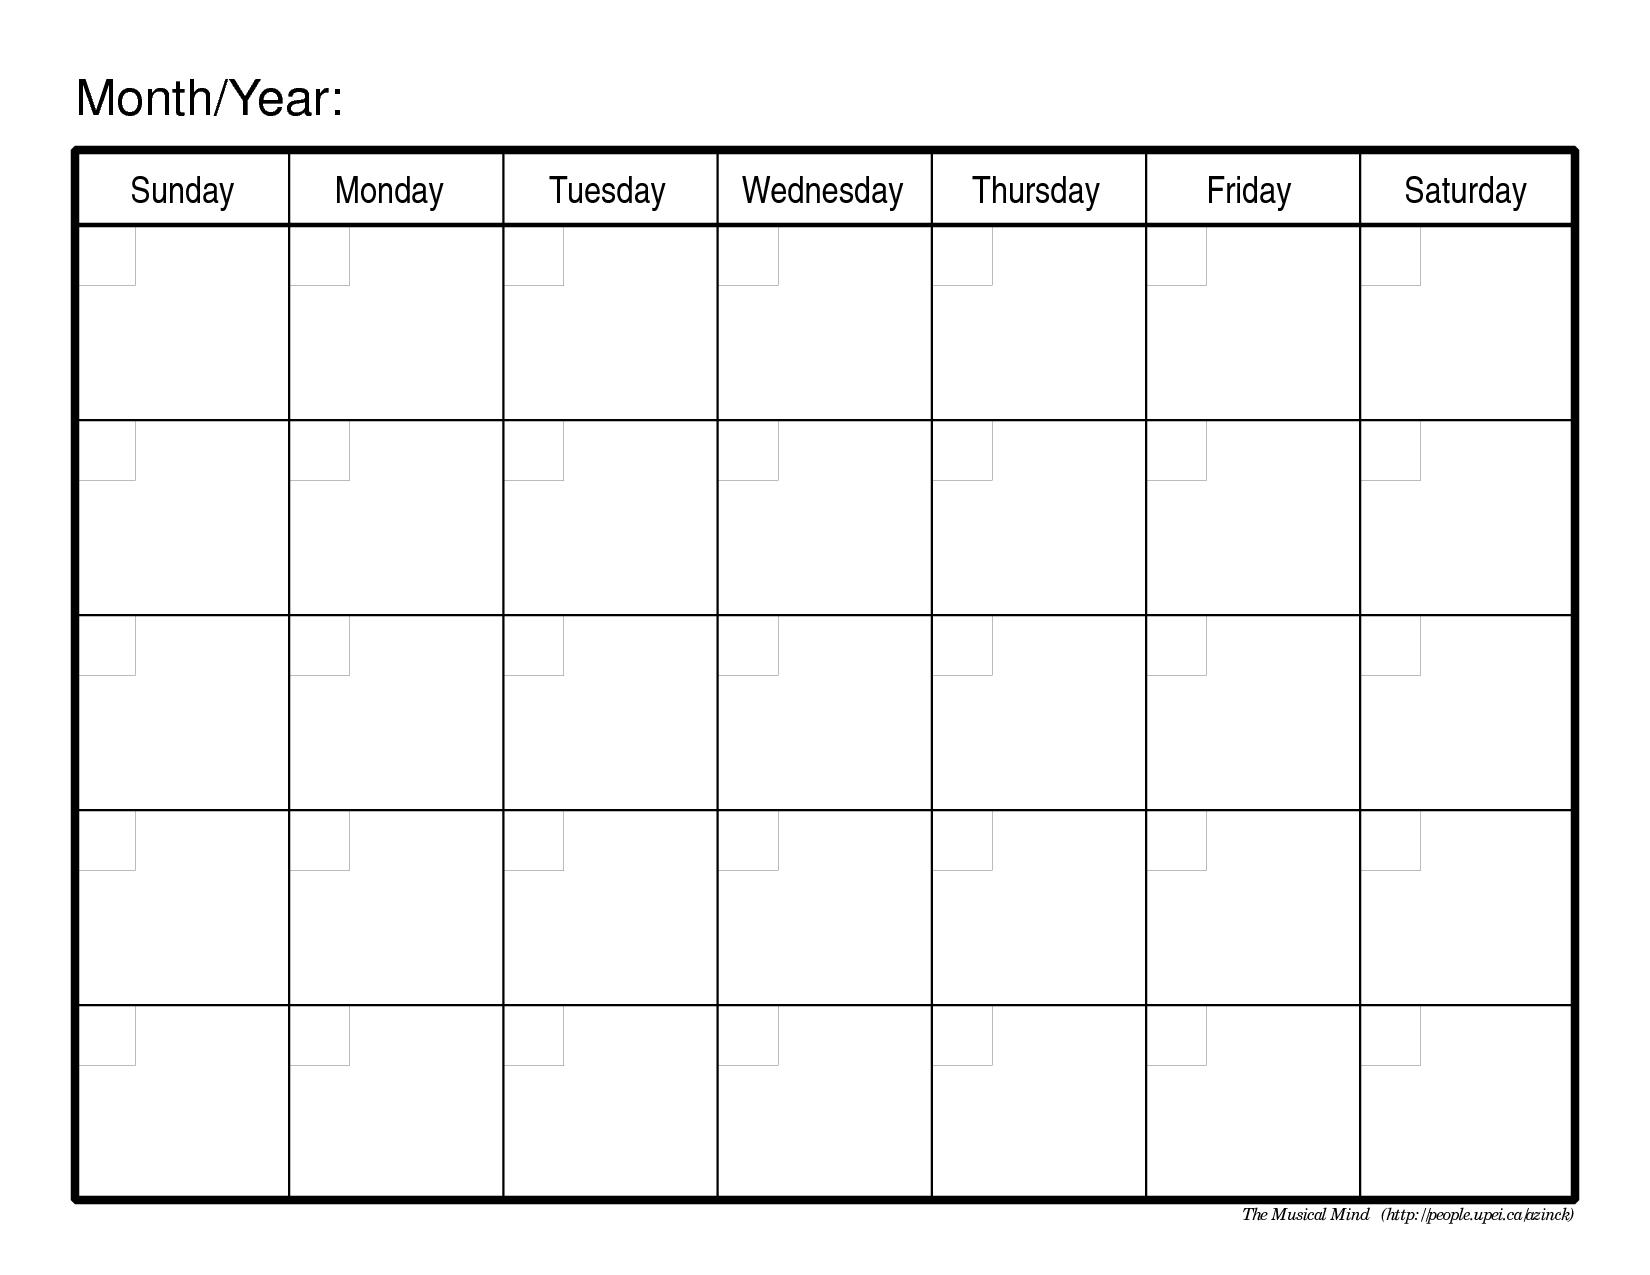 Monthly Calendar Template   Free Printable Calendar-Sundat To Saturday Printable Monthly Blank Calendar